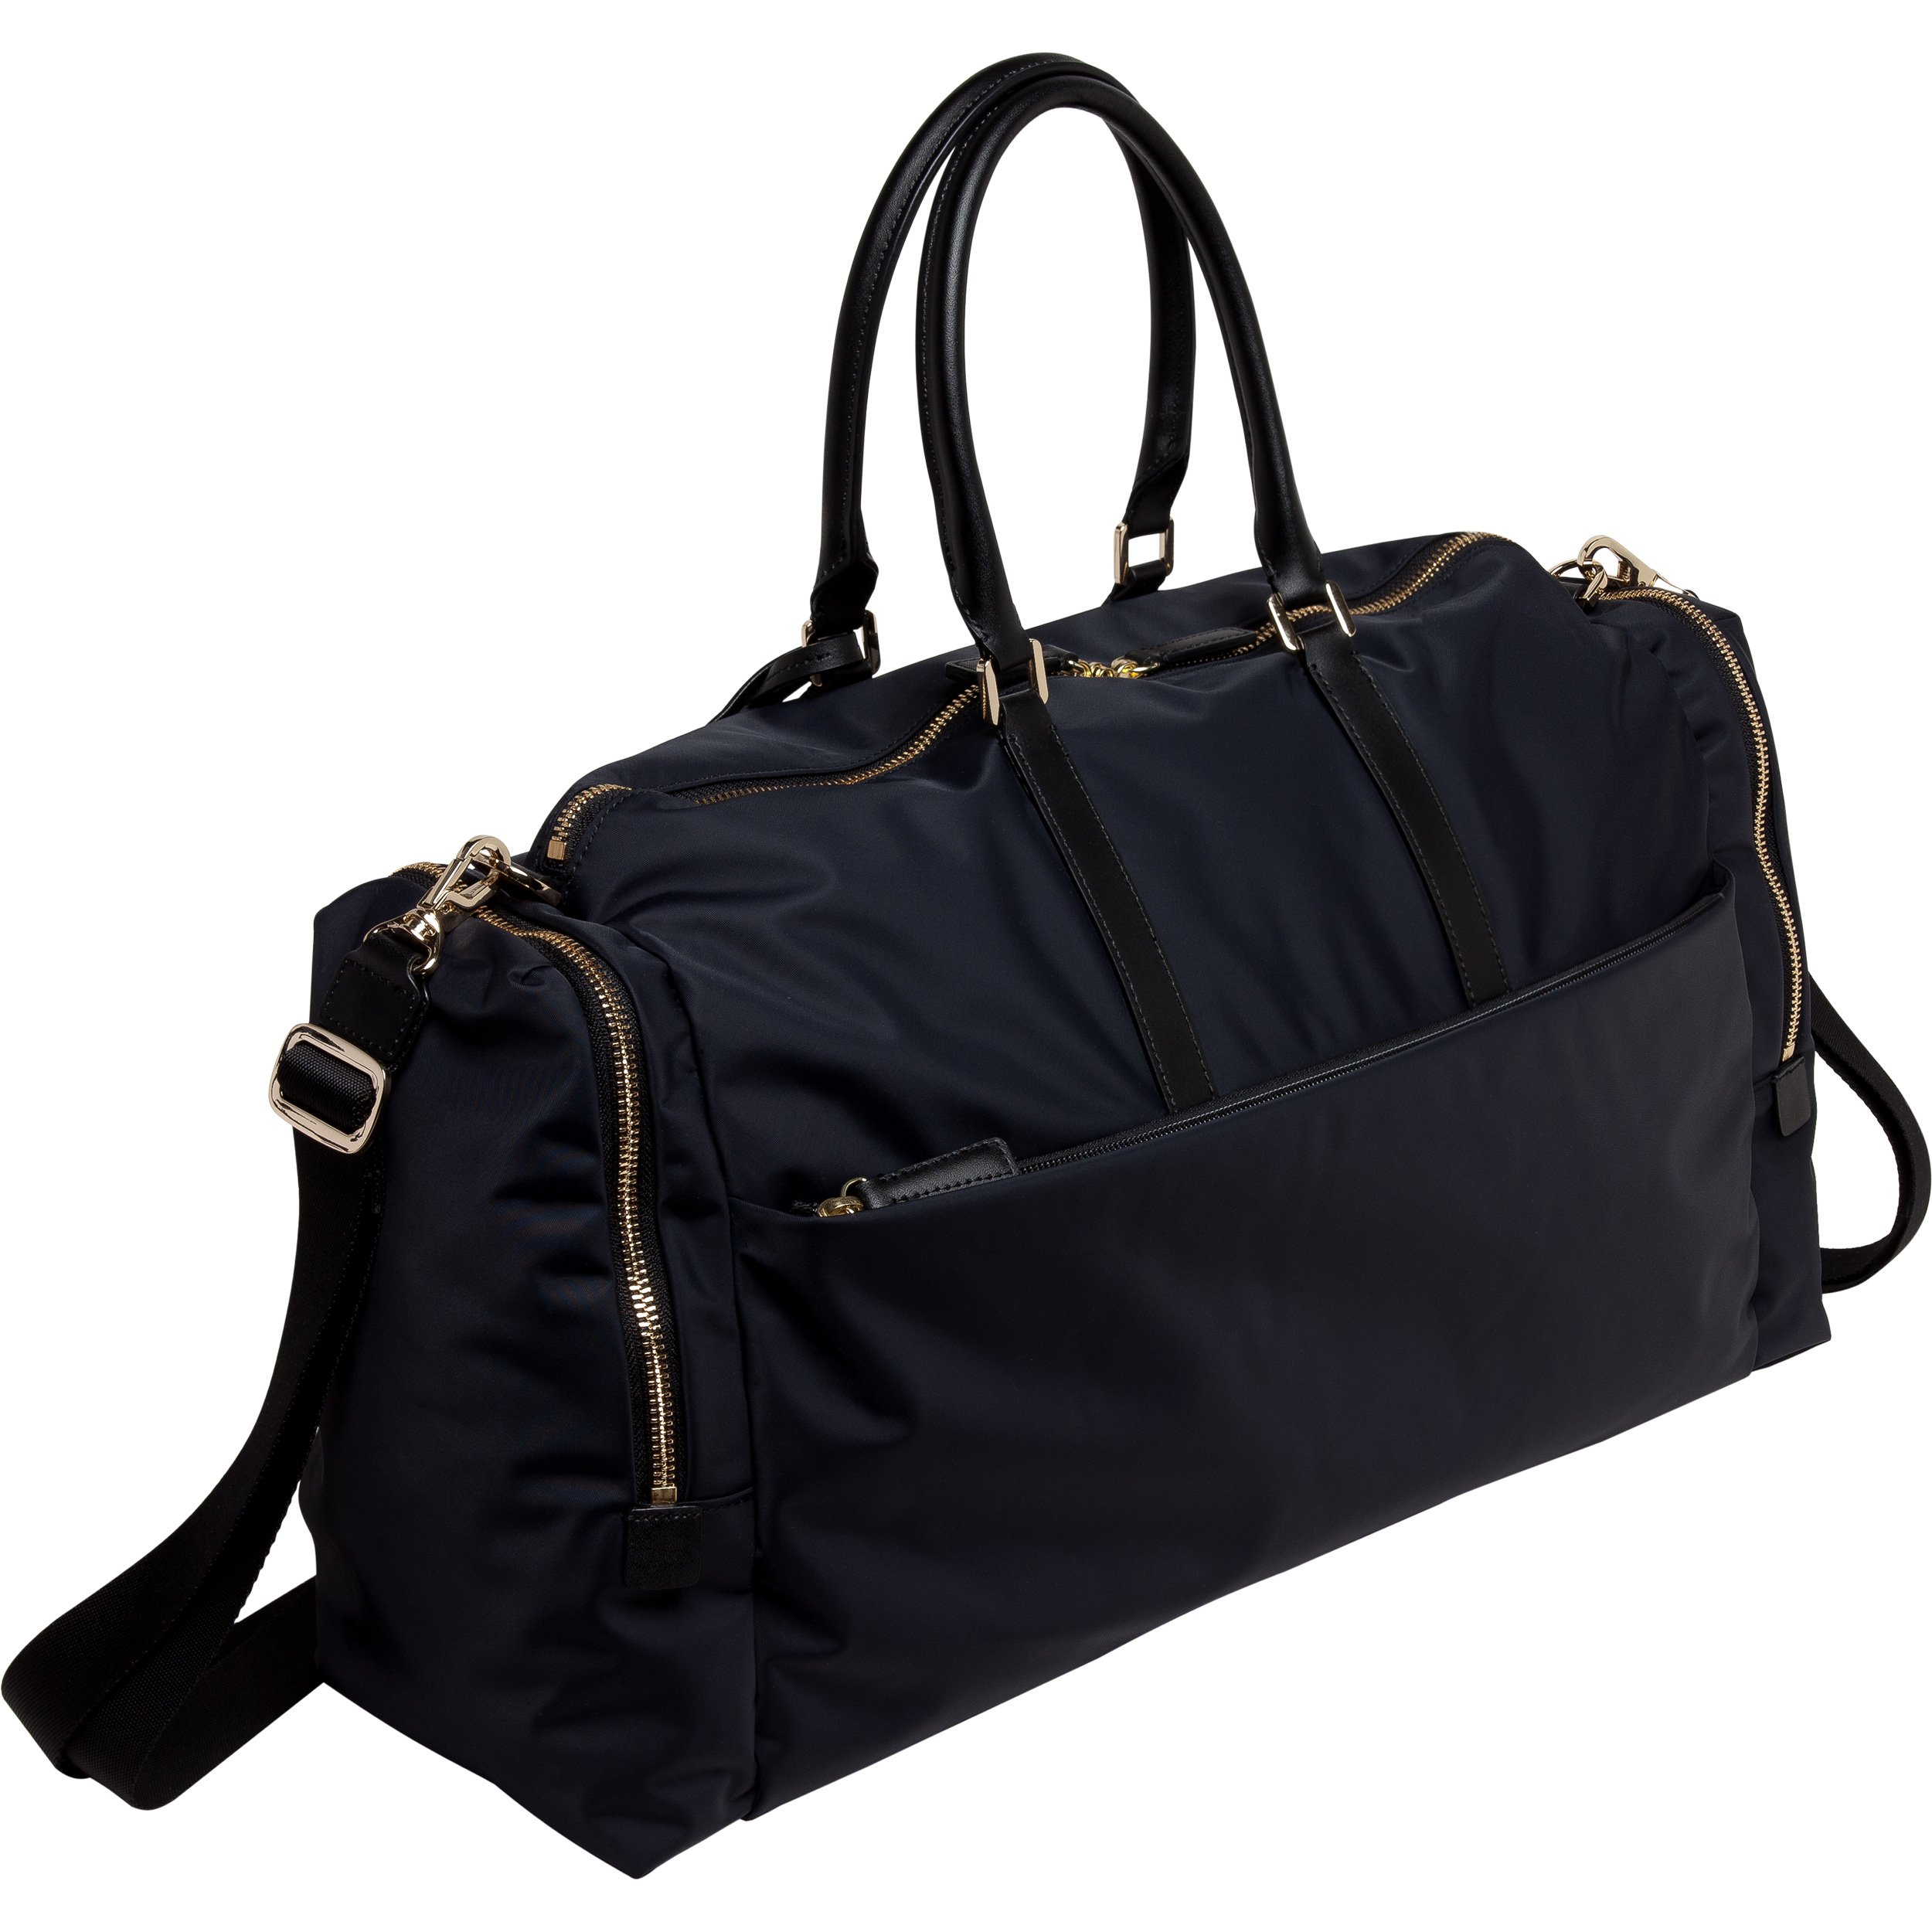 Agnès b. Black Travel Boston B Bag in Black | Lyst